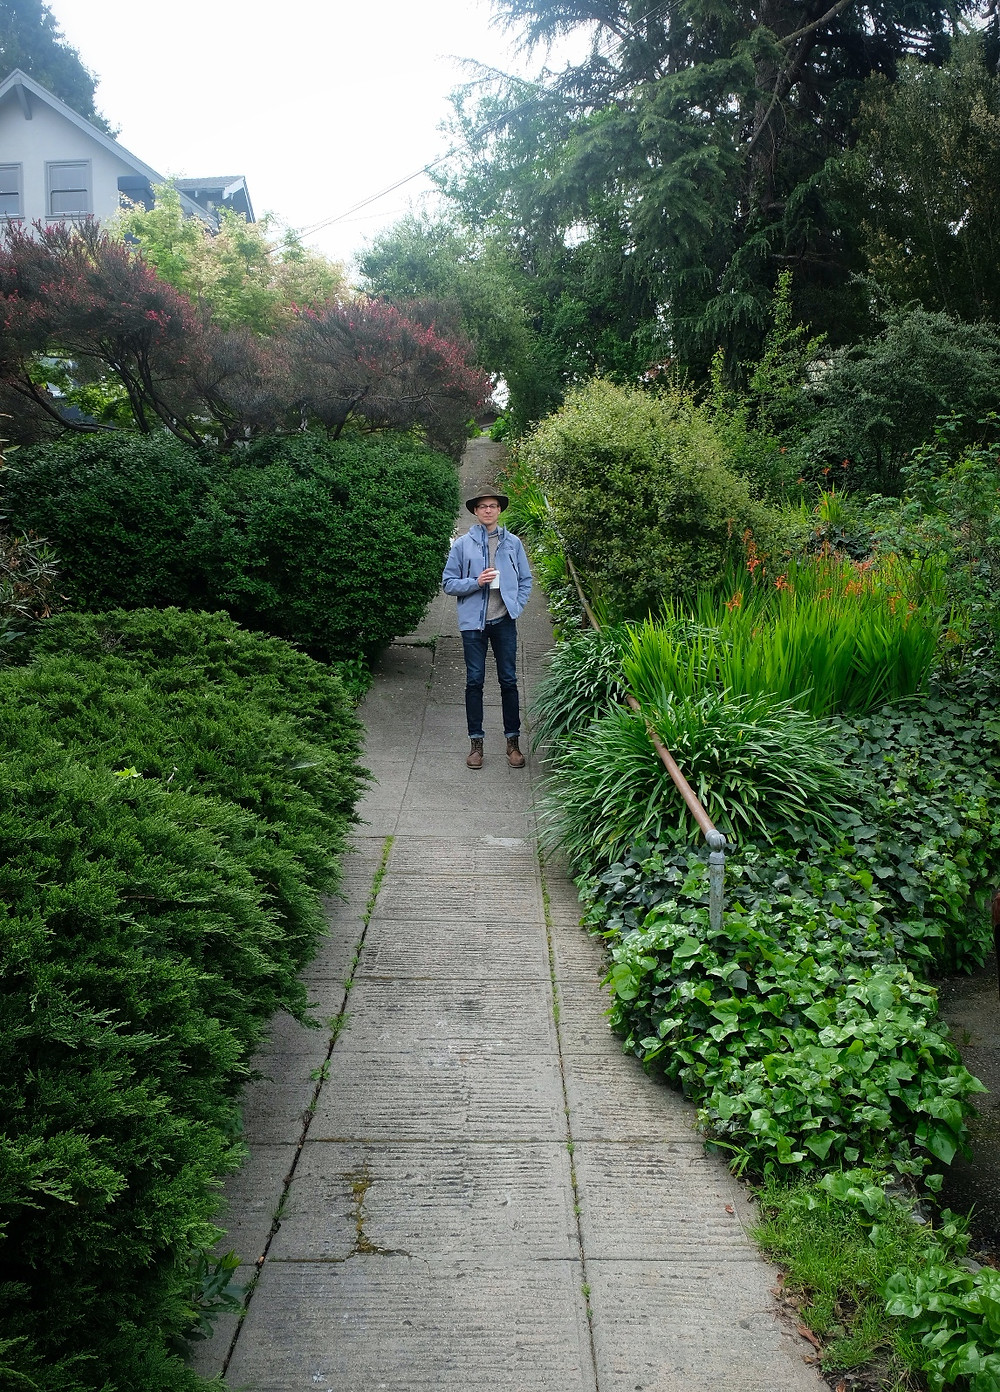 Shaded green trail